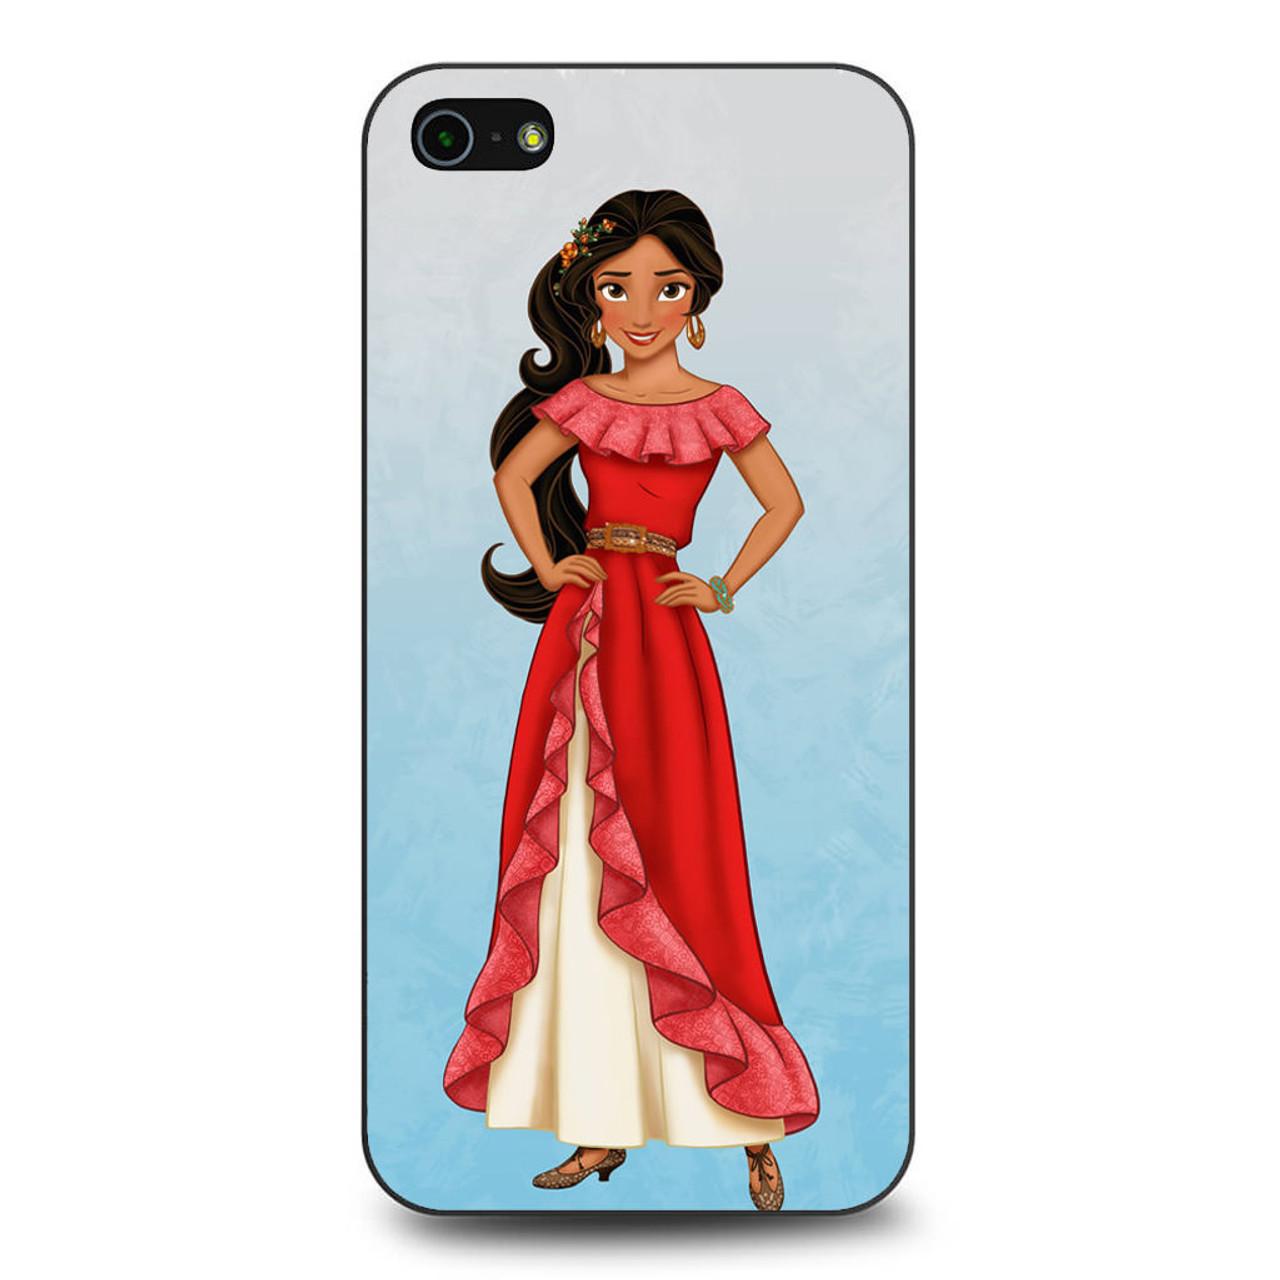 huge discount 31c87 11710 Disney Princess Elena of Avalor iPhone 5/5S/SE Case